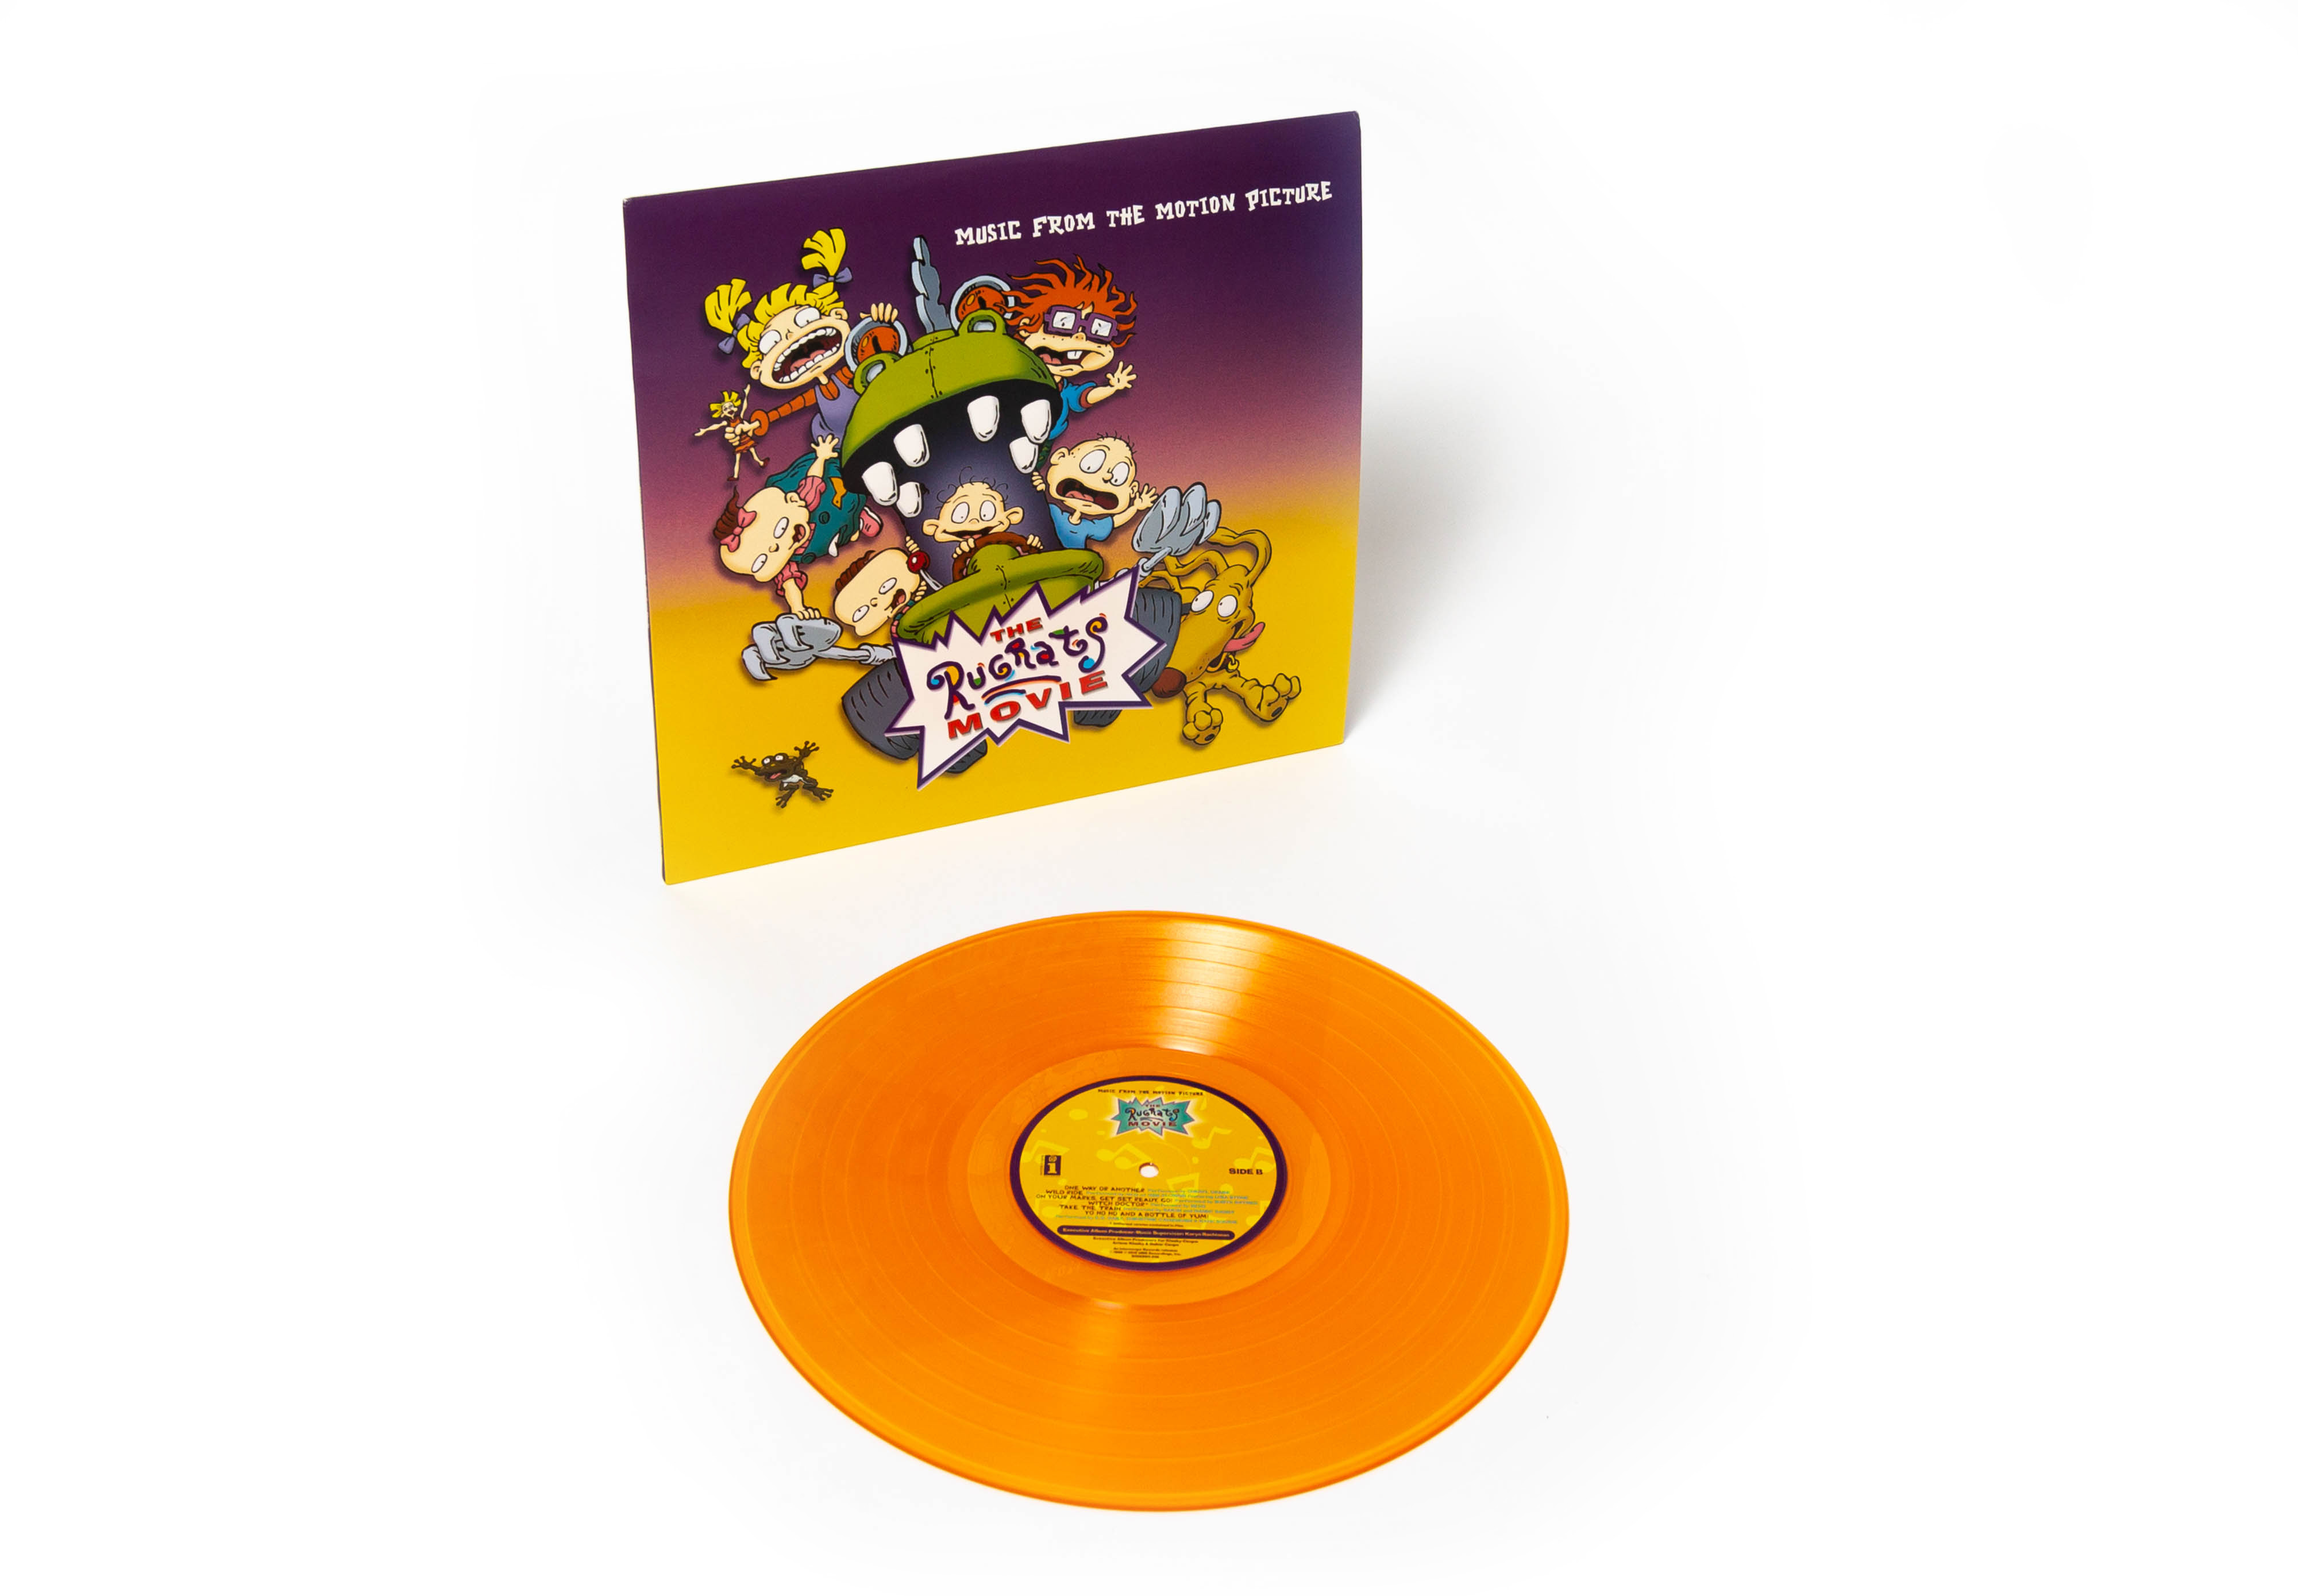 rugrats movie vinyl music release